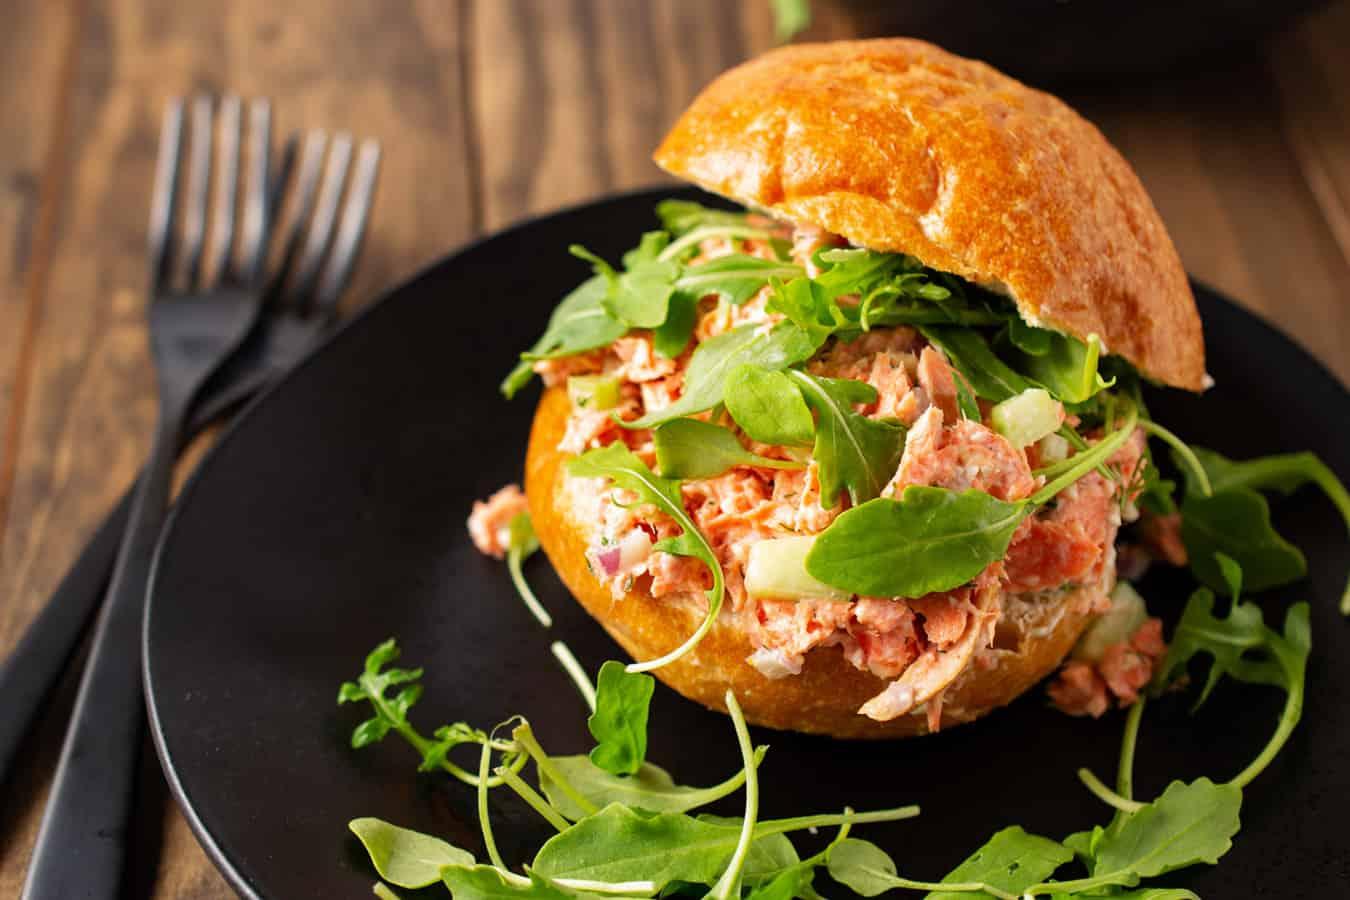 salmon salad sandich on plate